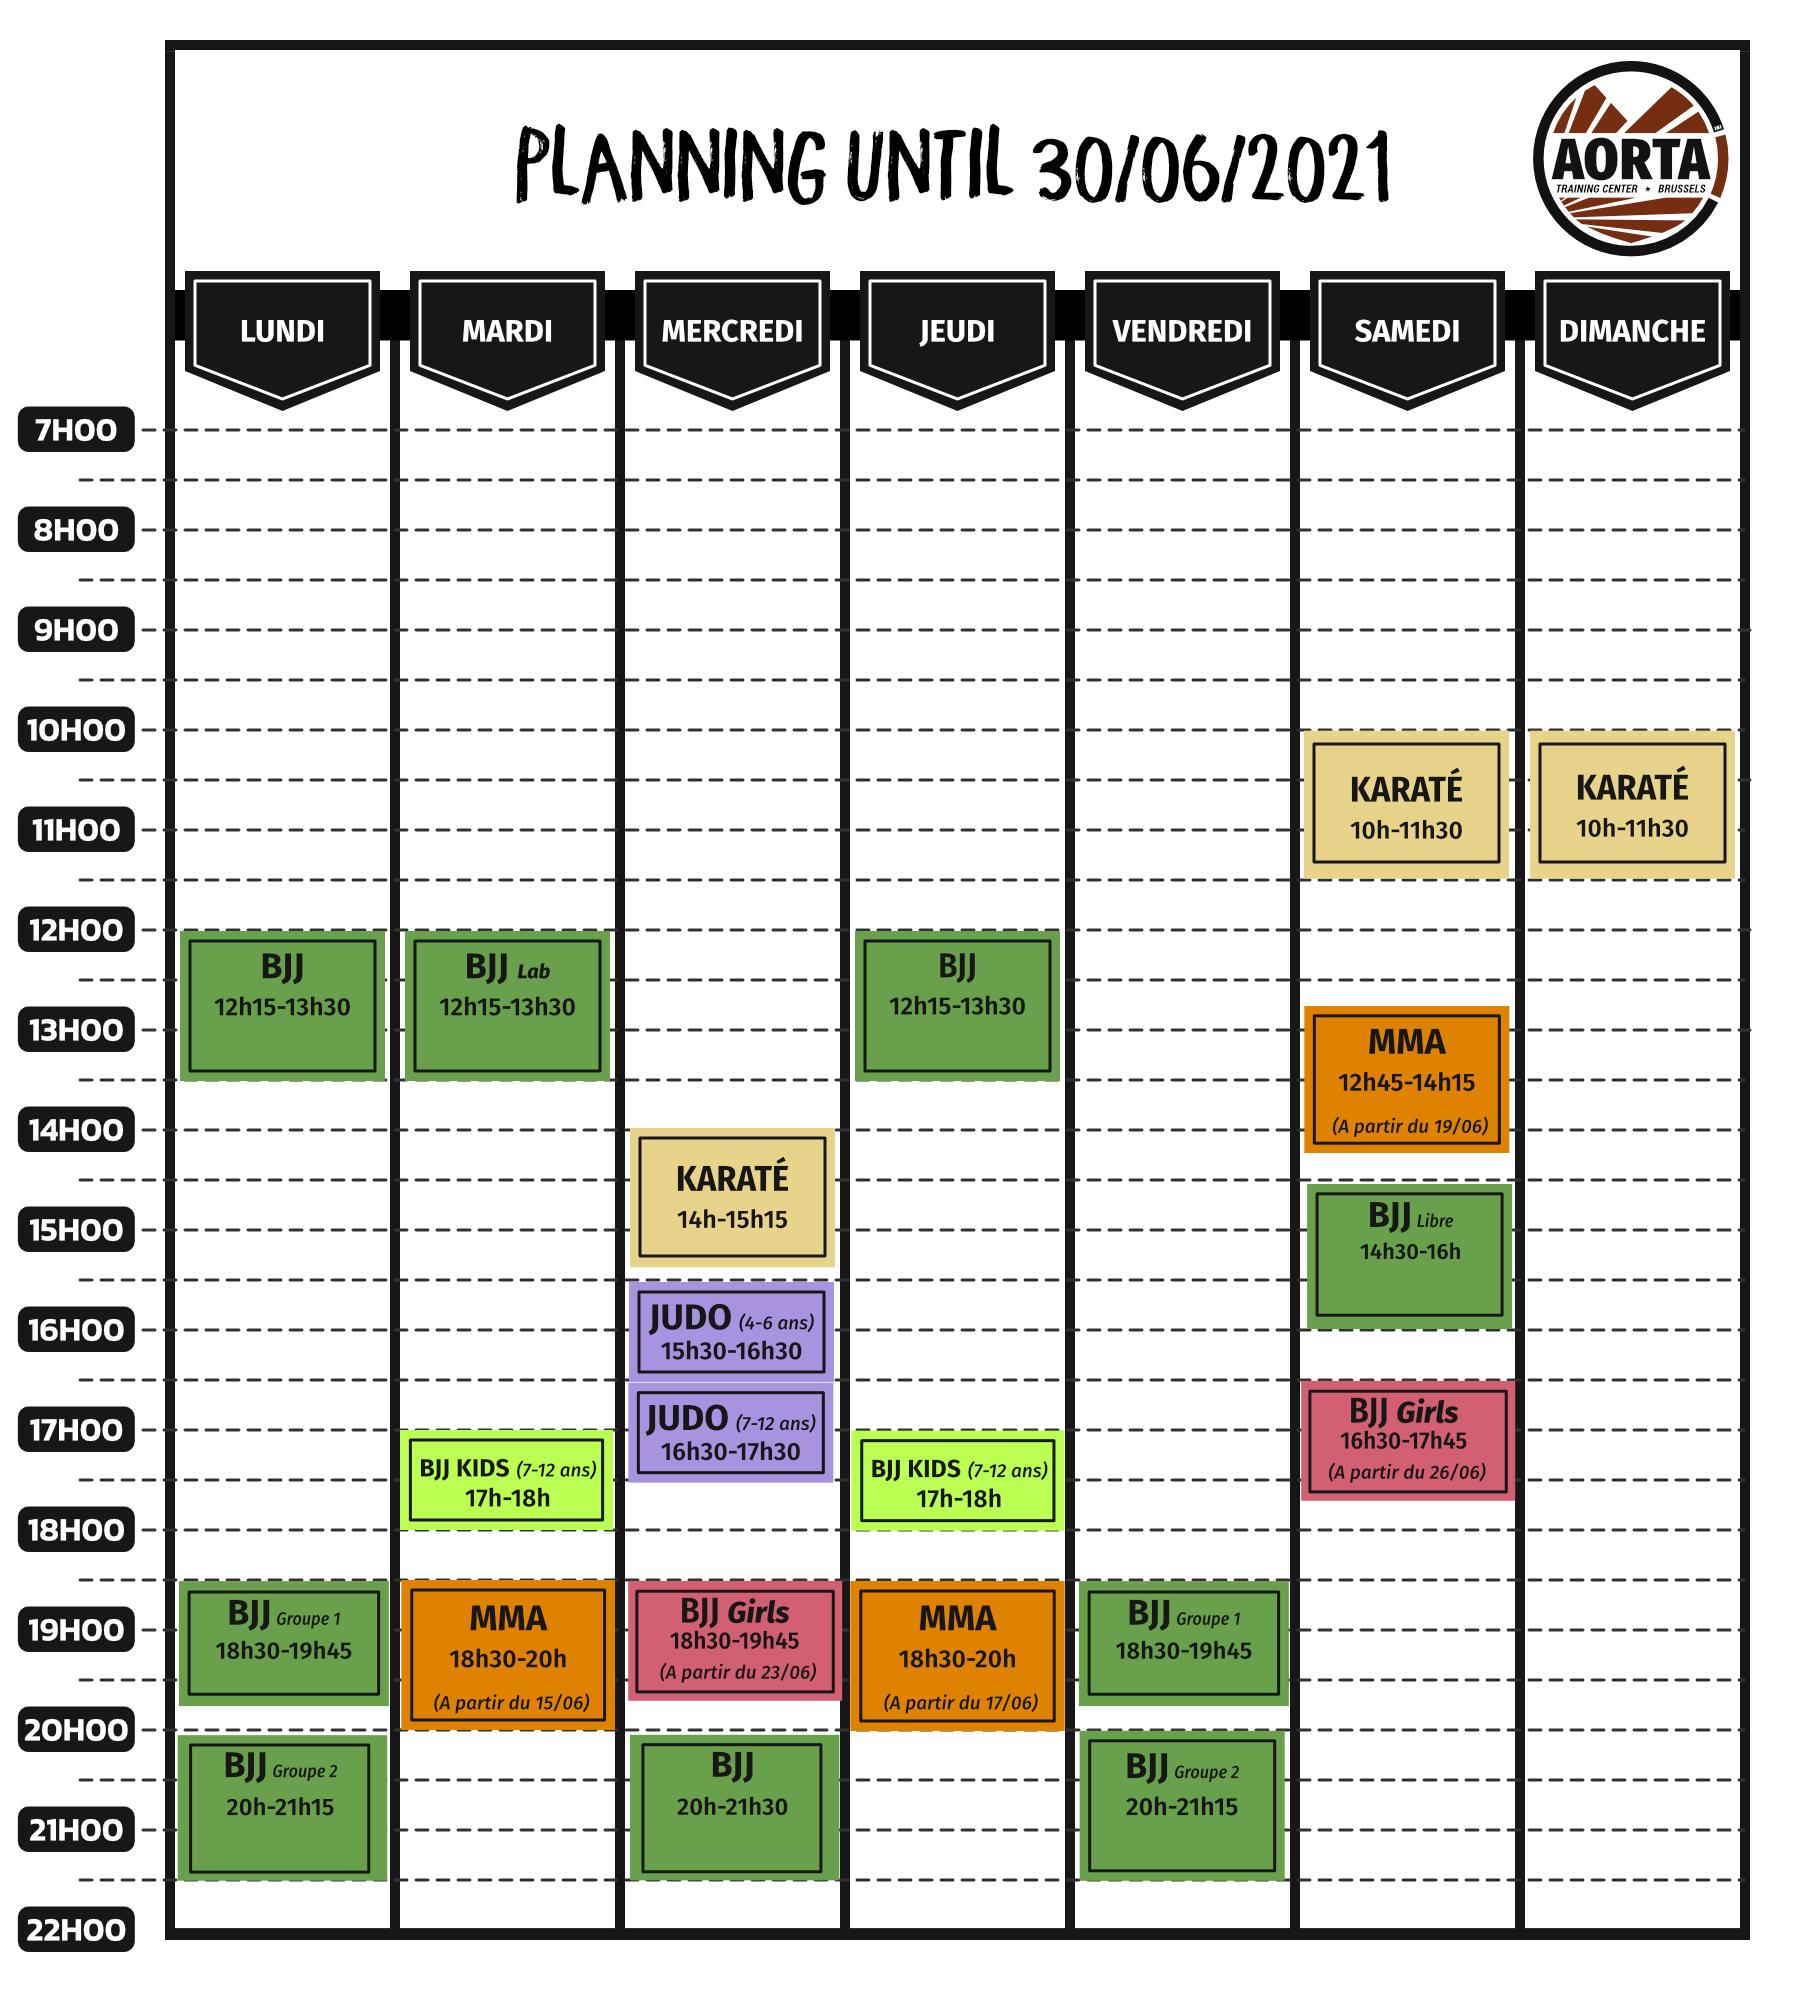 Planning summer until June 30th